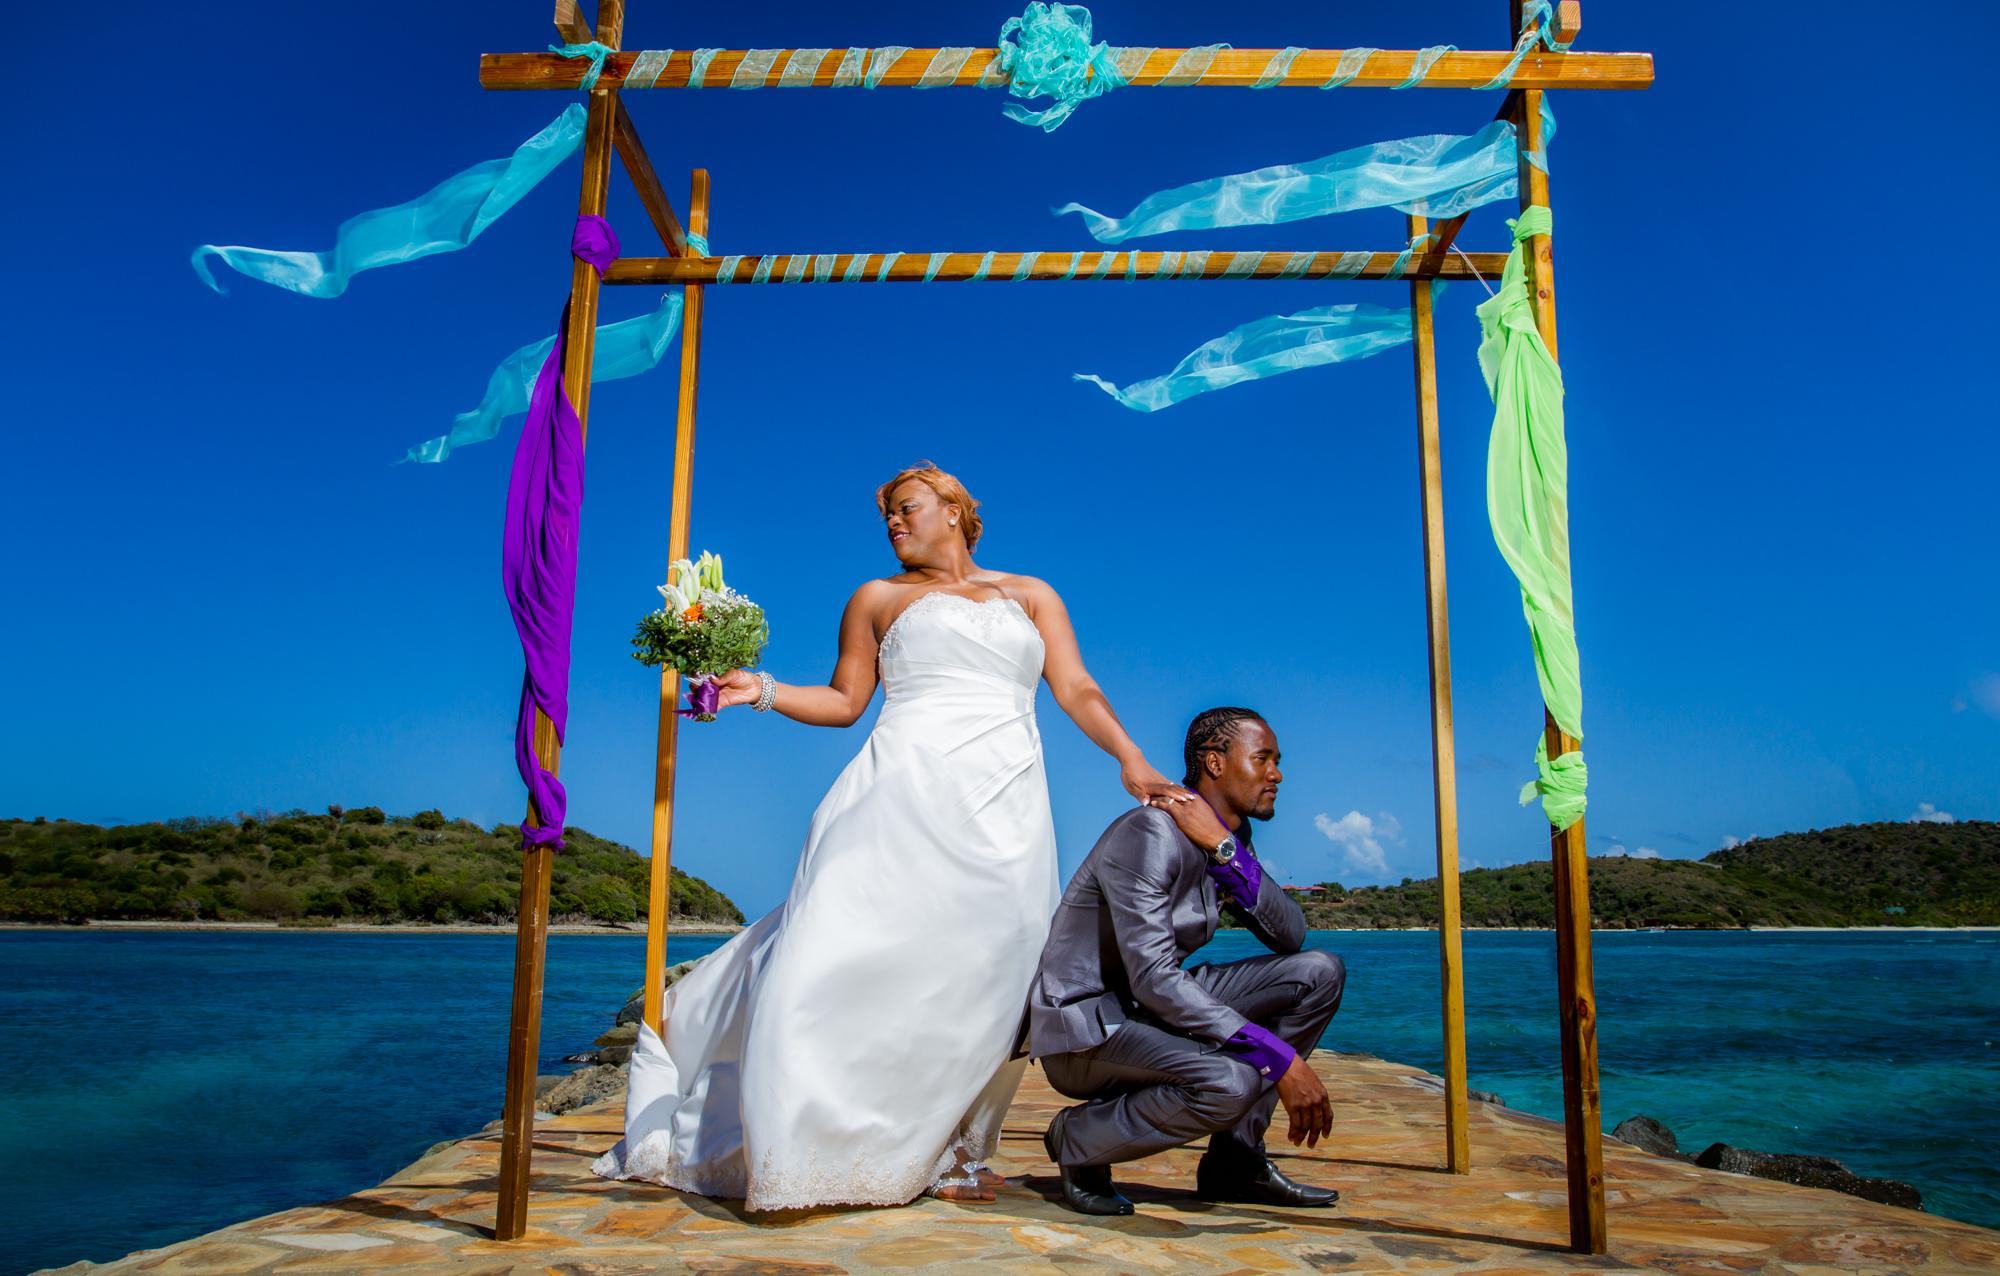 entry-35-damepeters_damepetersphotography_weddingbliss.jpg